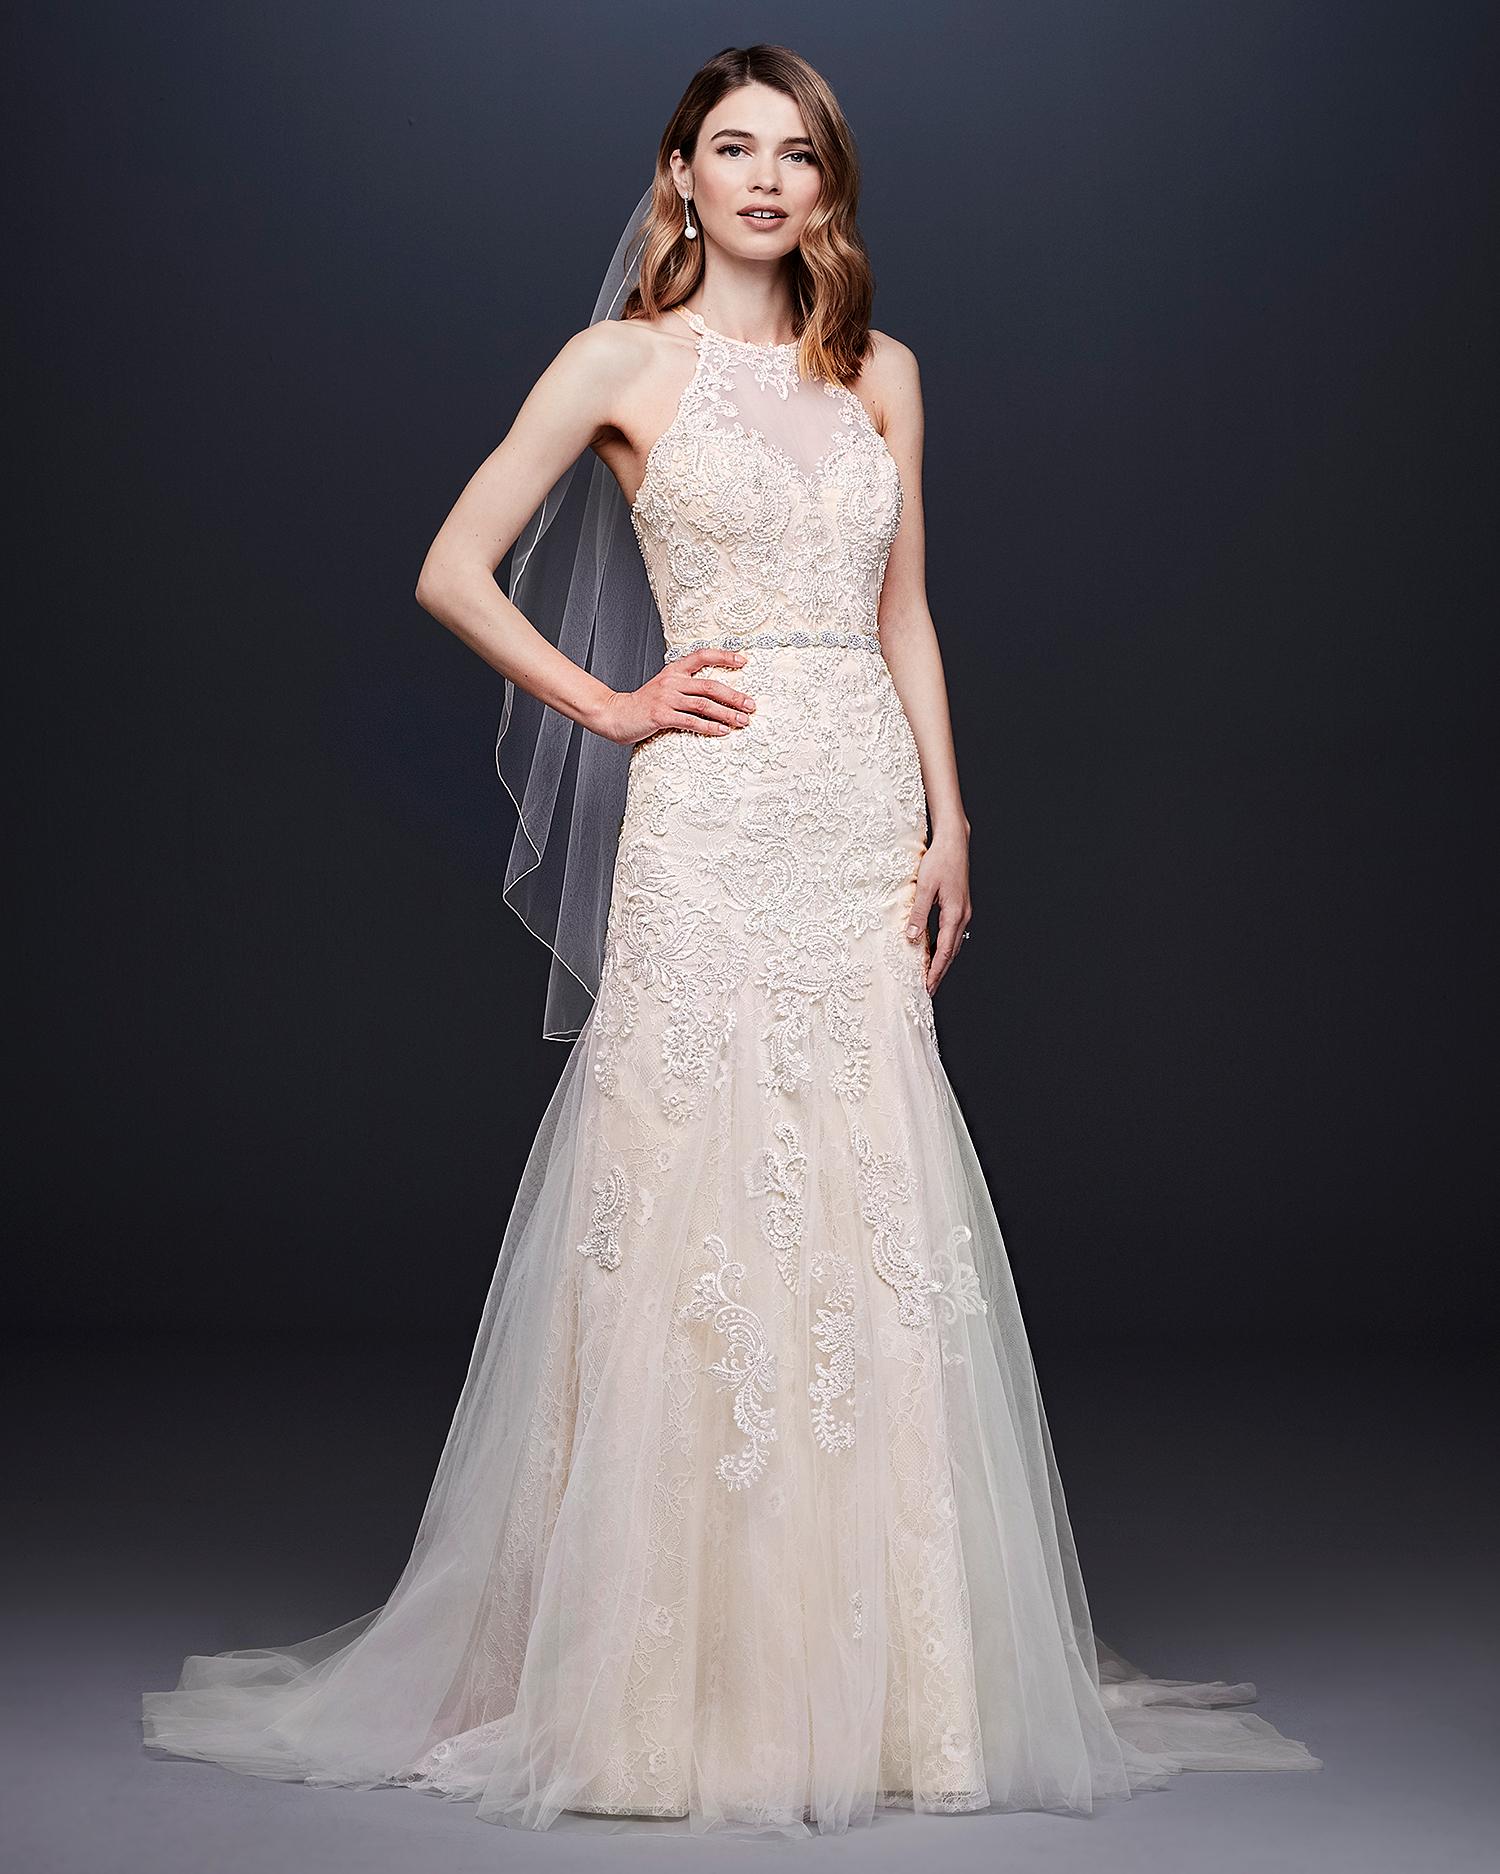 davids bridal wedding dress fall 2019 embroidered overlay high-neck